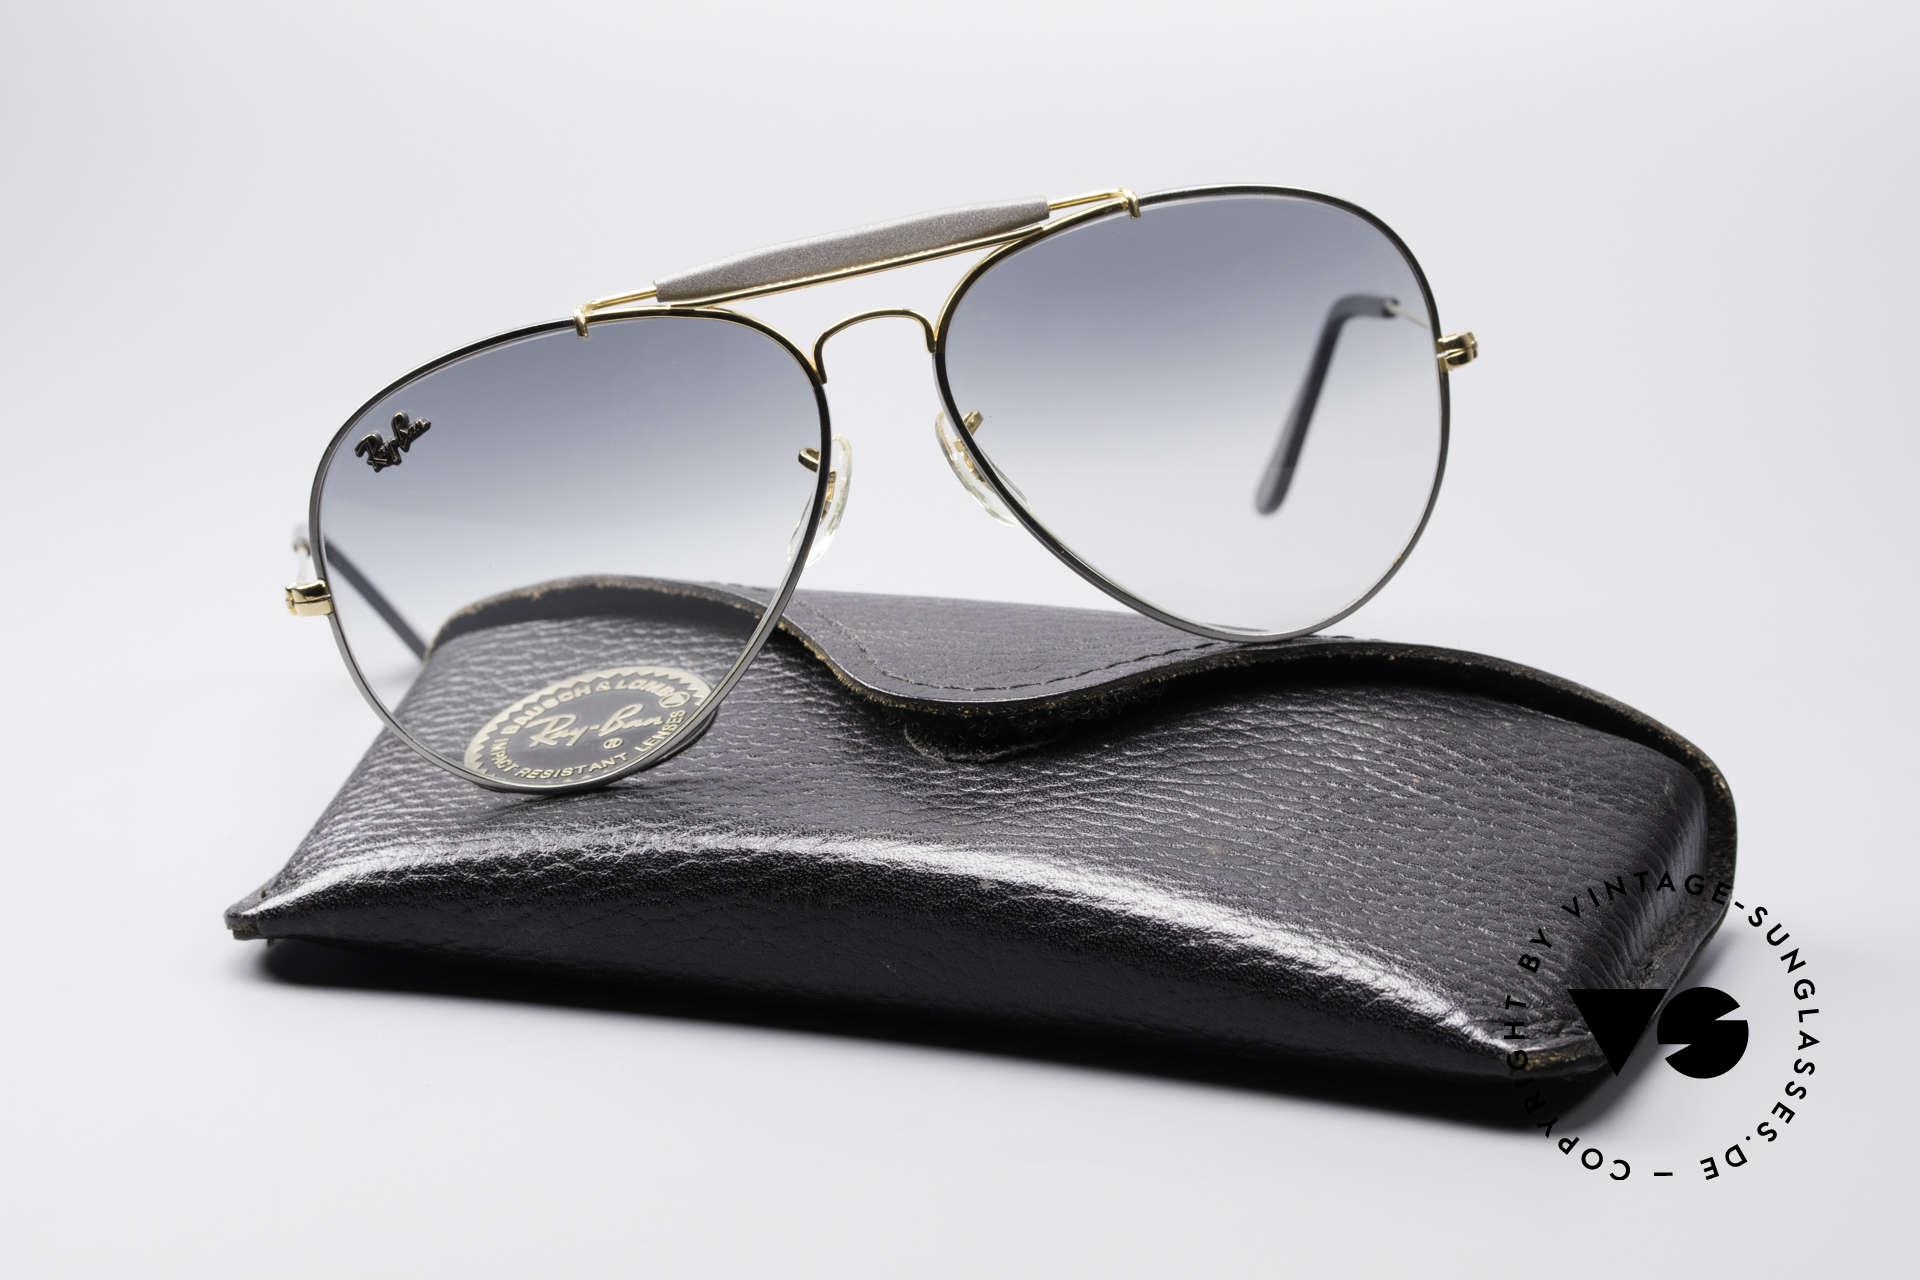 6686125dc0bc66 Sonnenbrillen Ray Ban Outdoorsman II Precious Metals Titanium   Vintage  Sunglasses